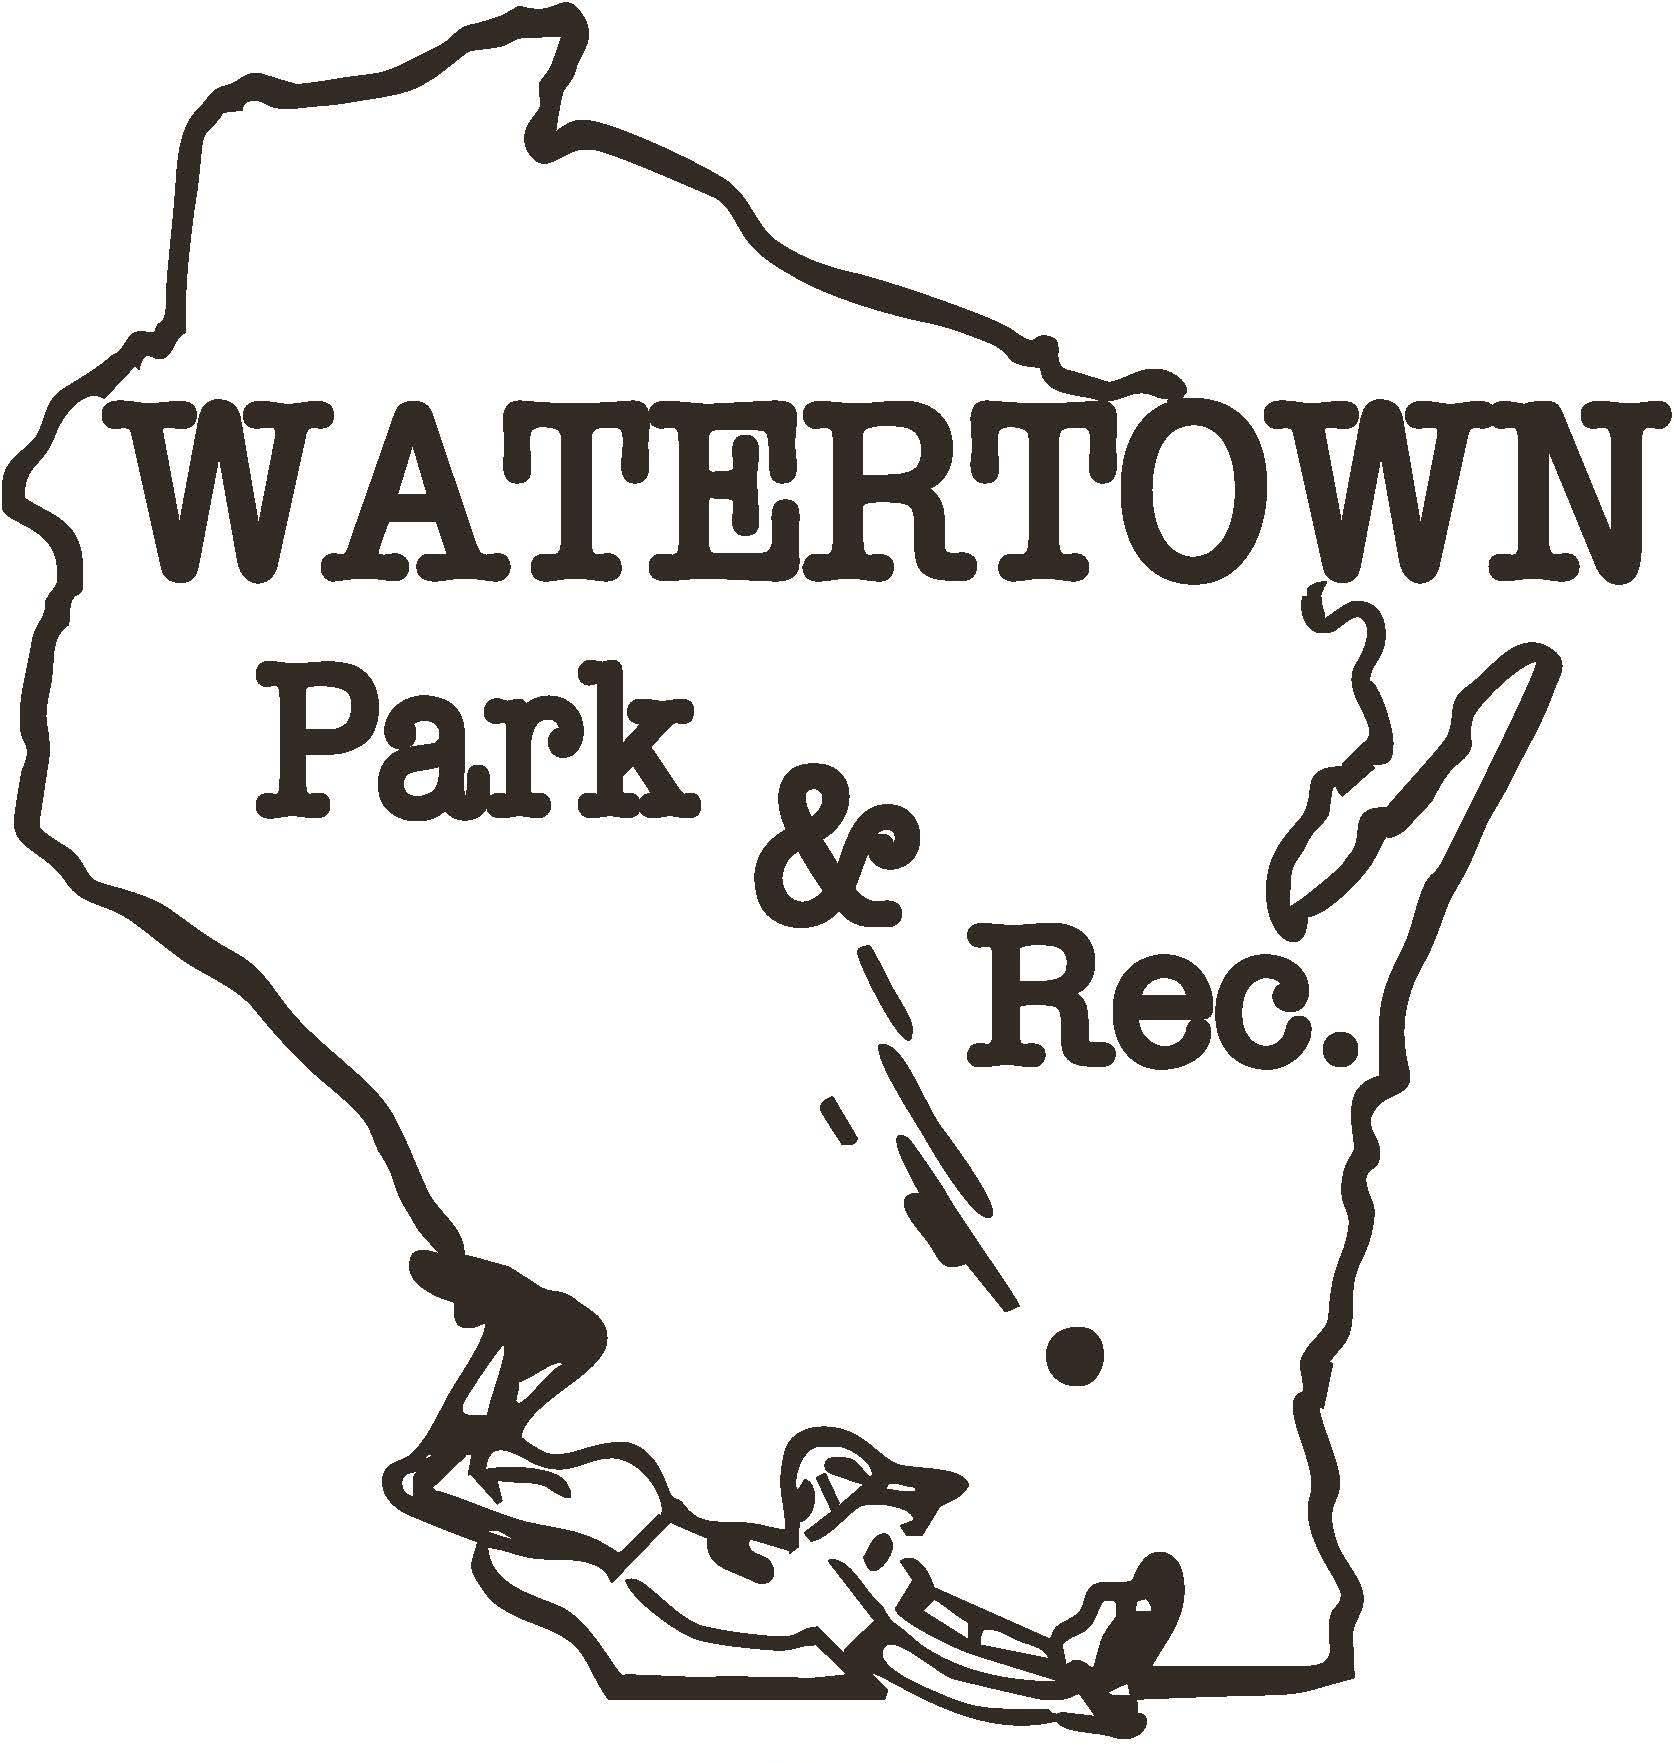 Watertown Youth Baseball